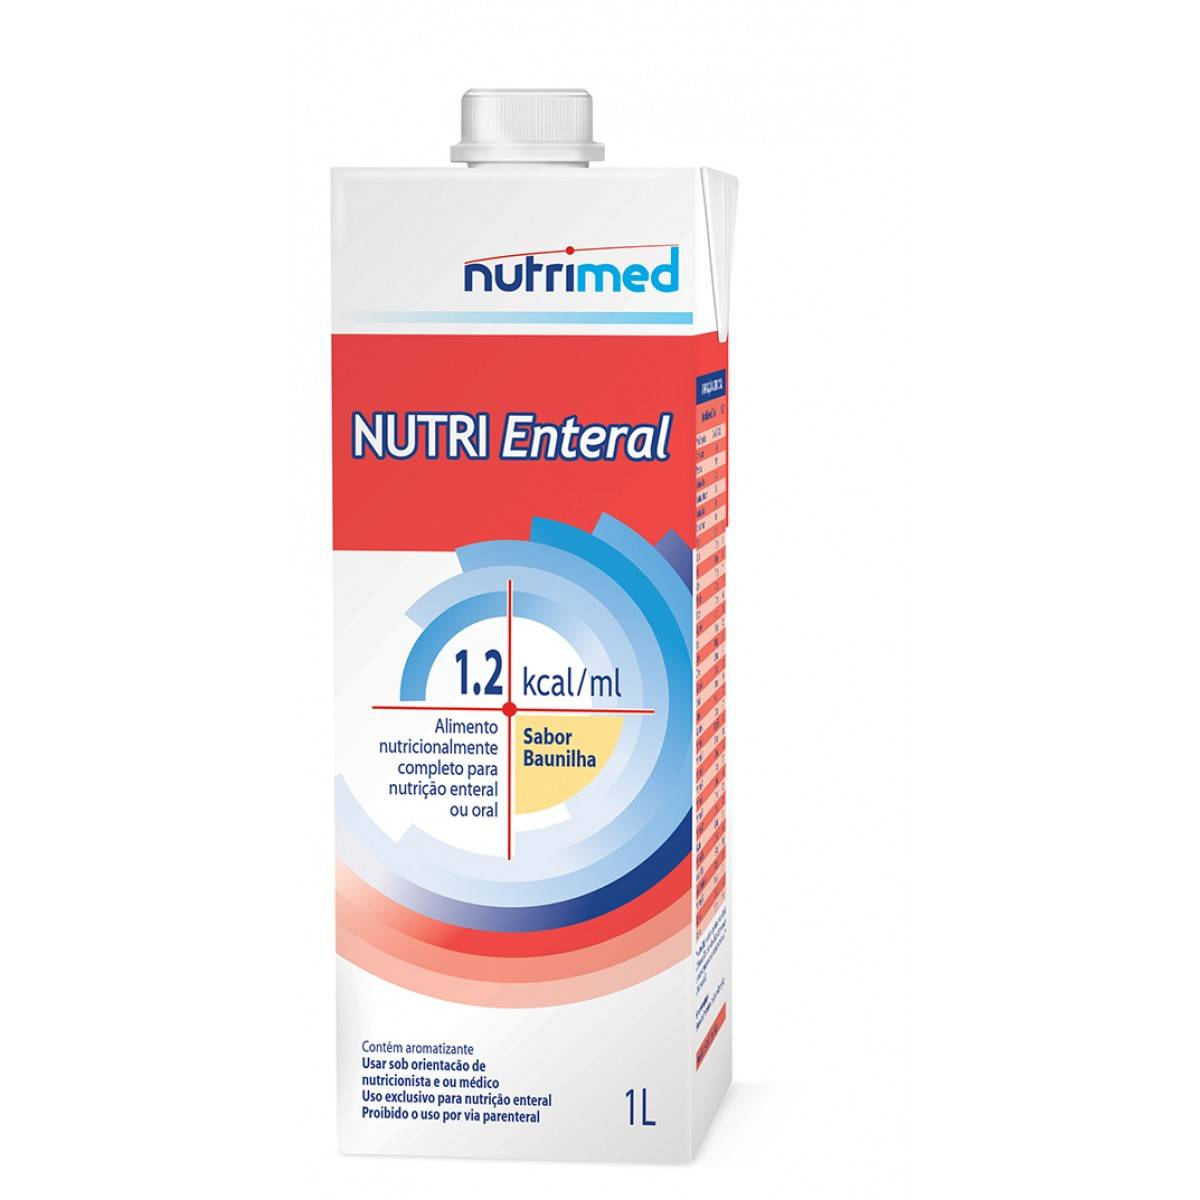 Nutri Enteral  (1.2 Kcal/ml) 1L tetra pak - (Danone)